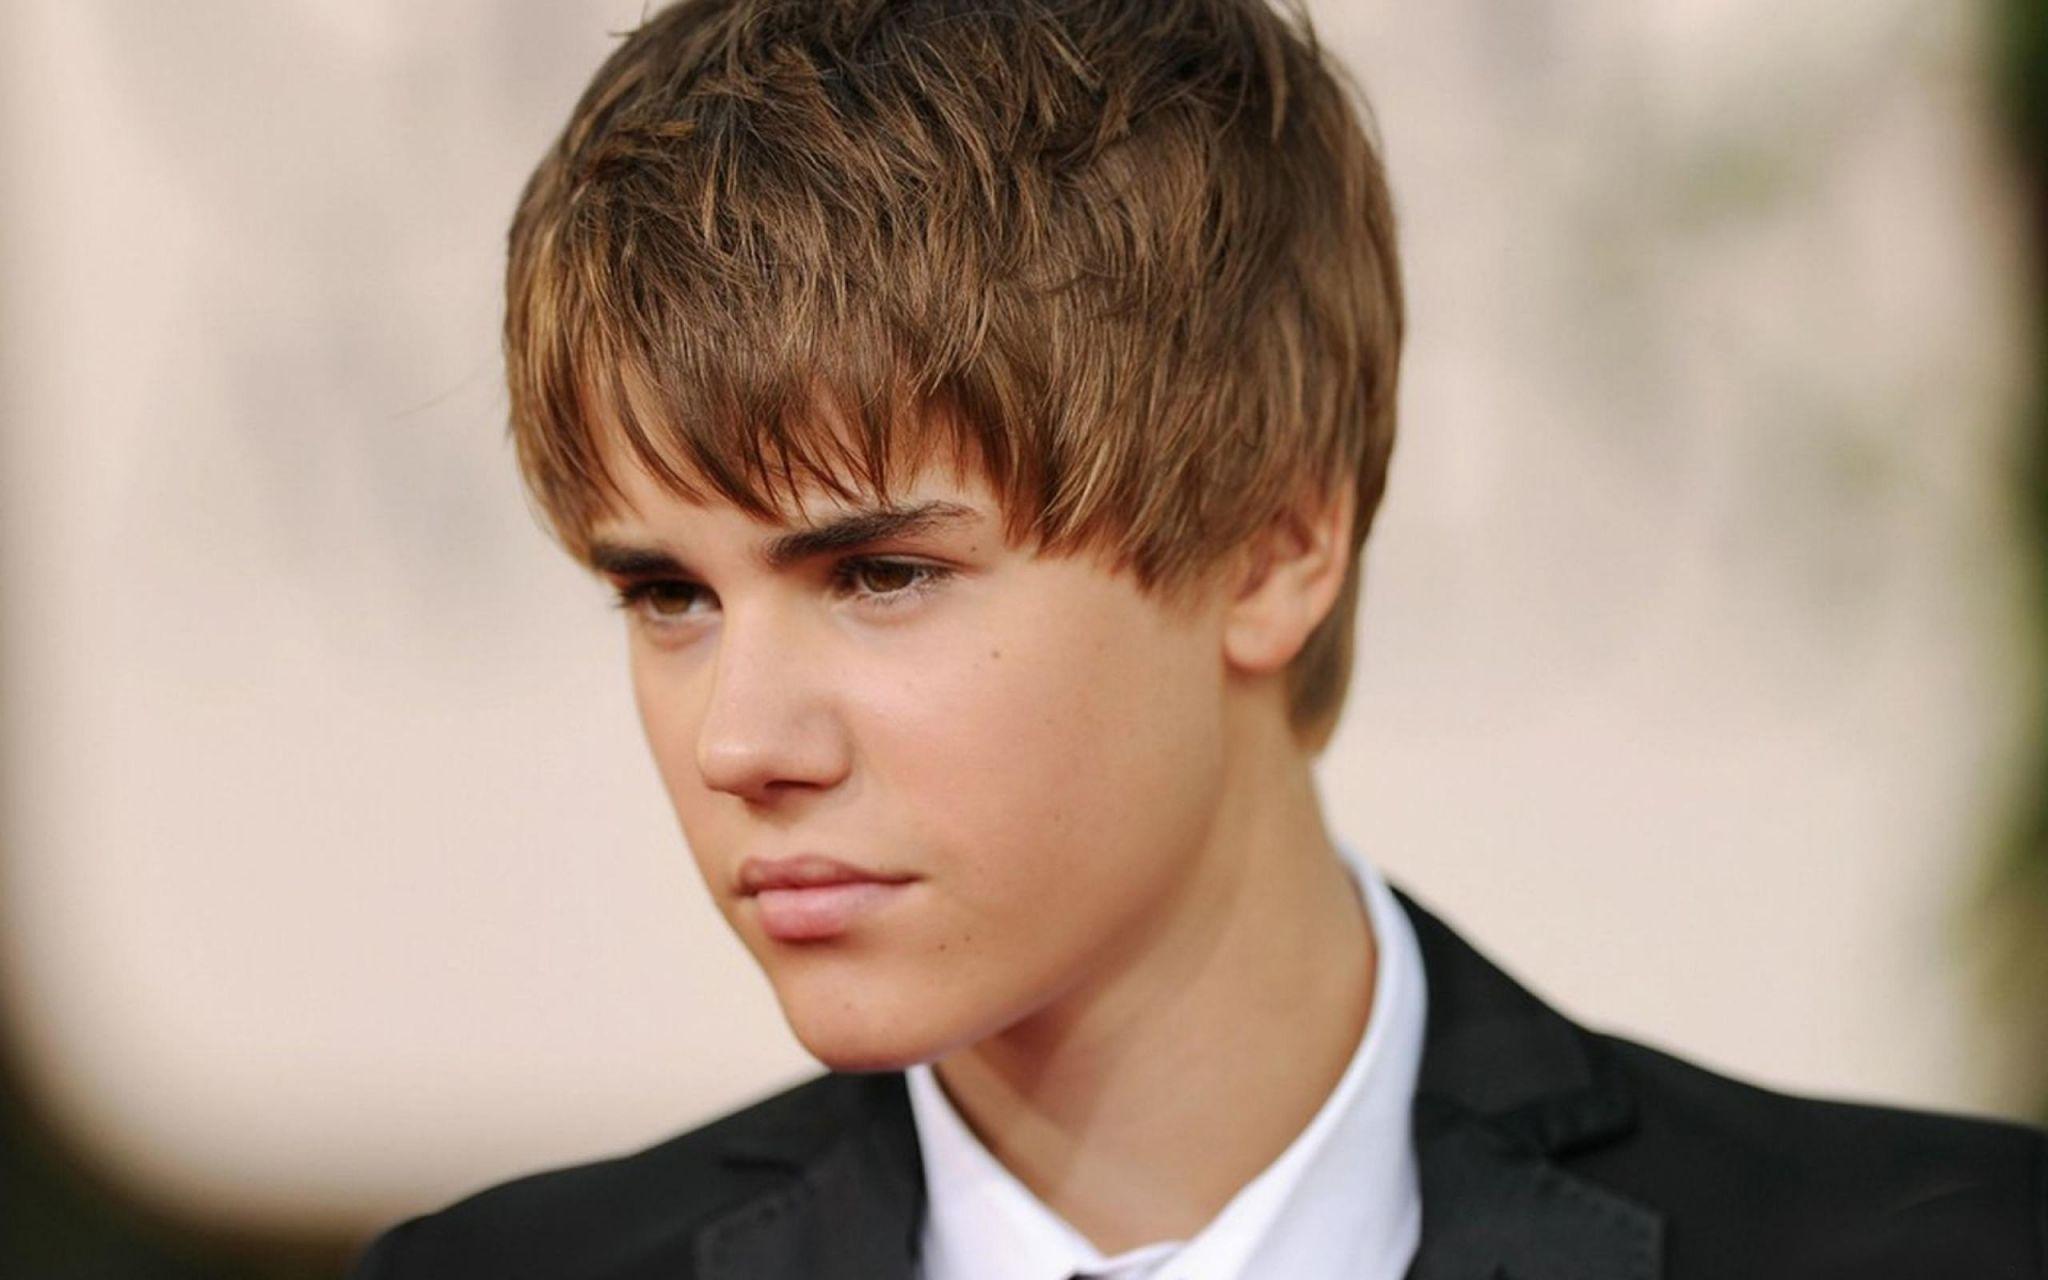 Boy hairstyle hd justin bieber wallpaper backgrounds hd  hair  pinterest